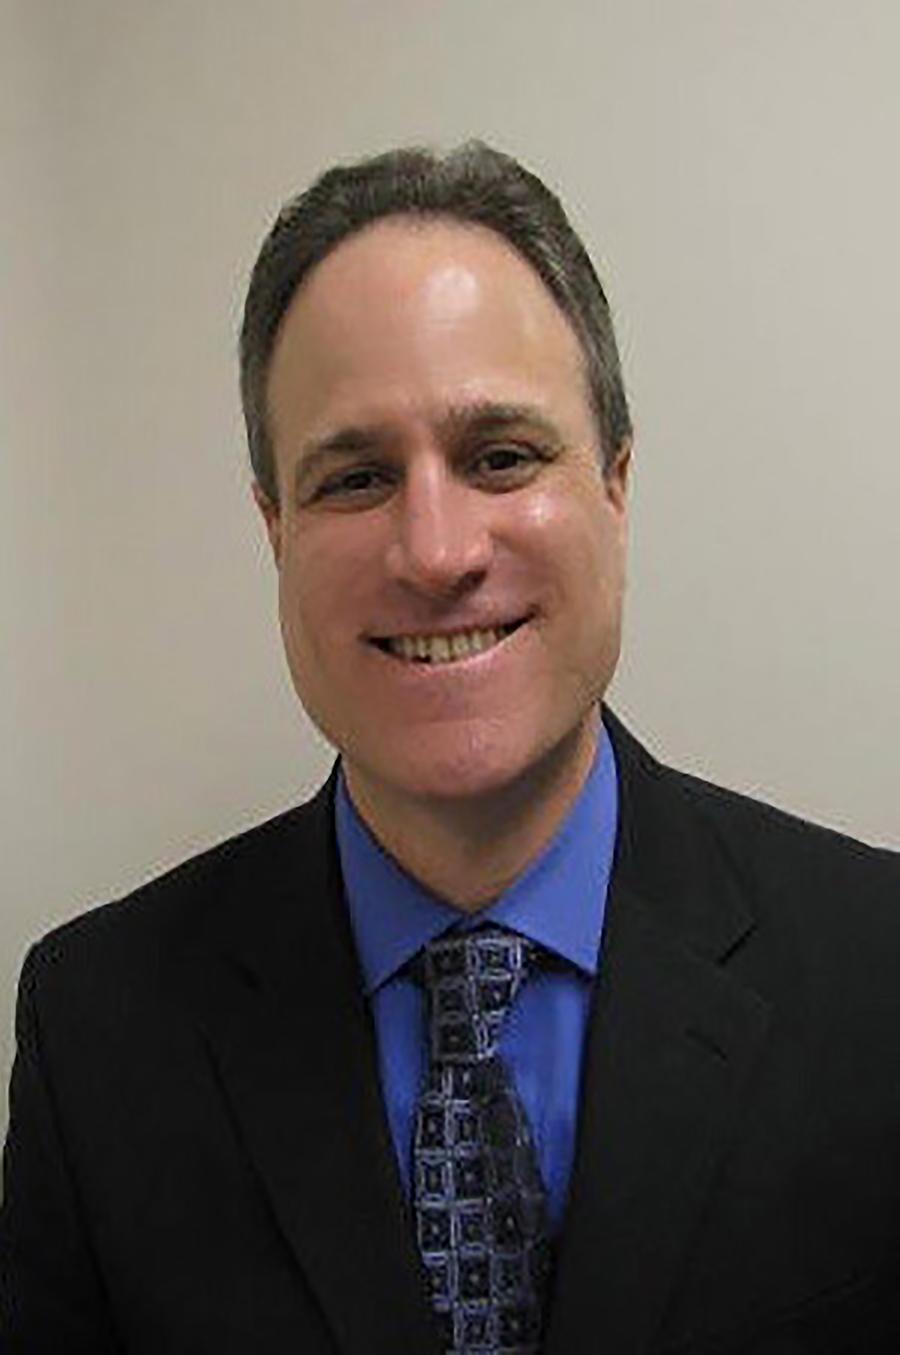 Michael Sinacore